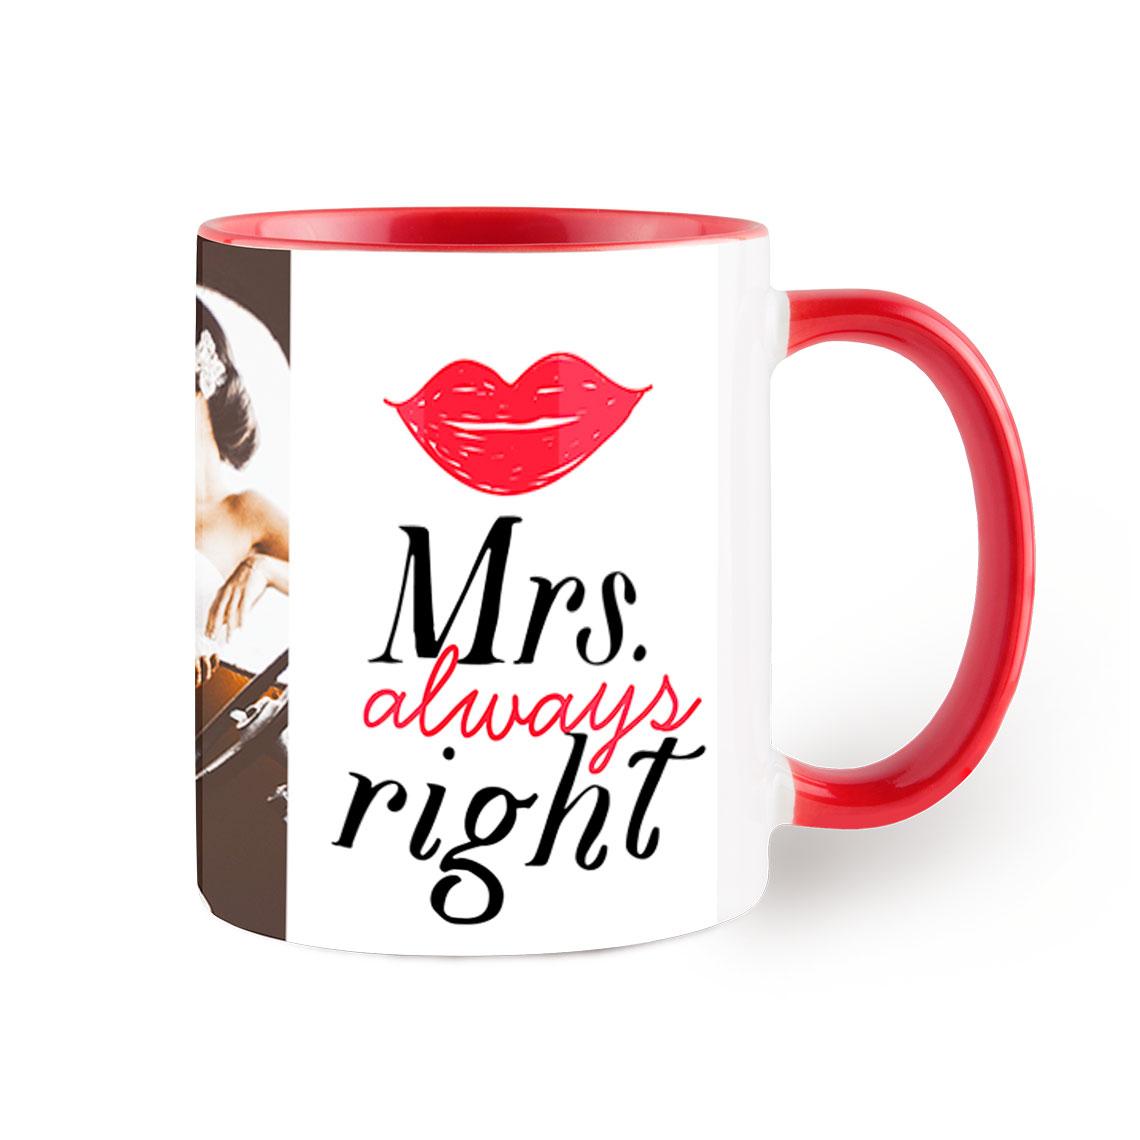 photo red coffee mug